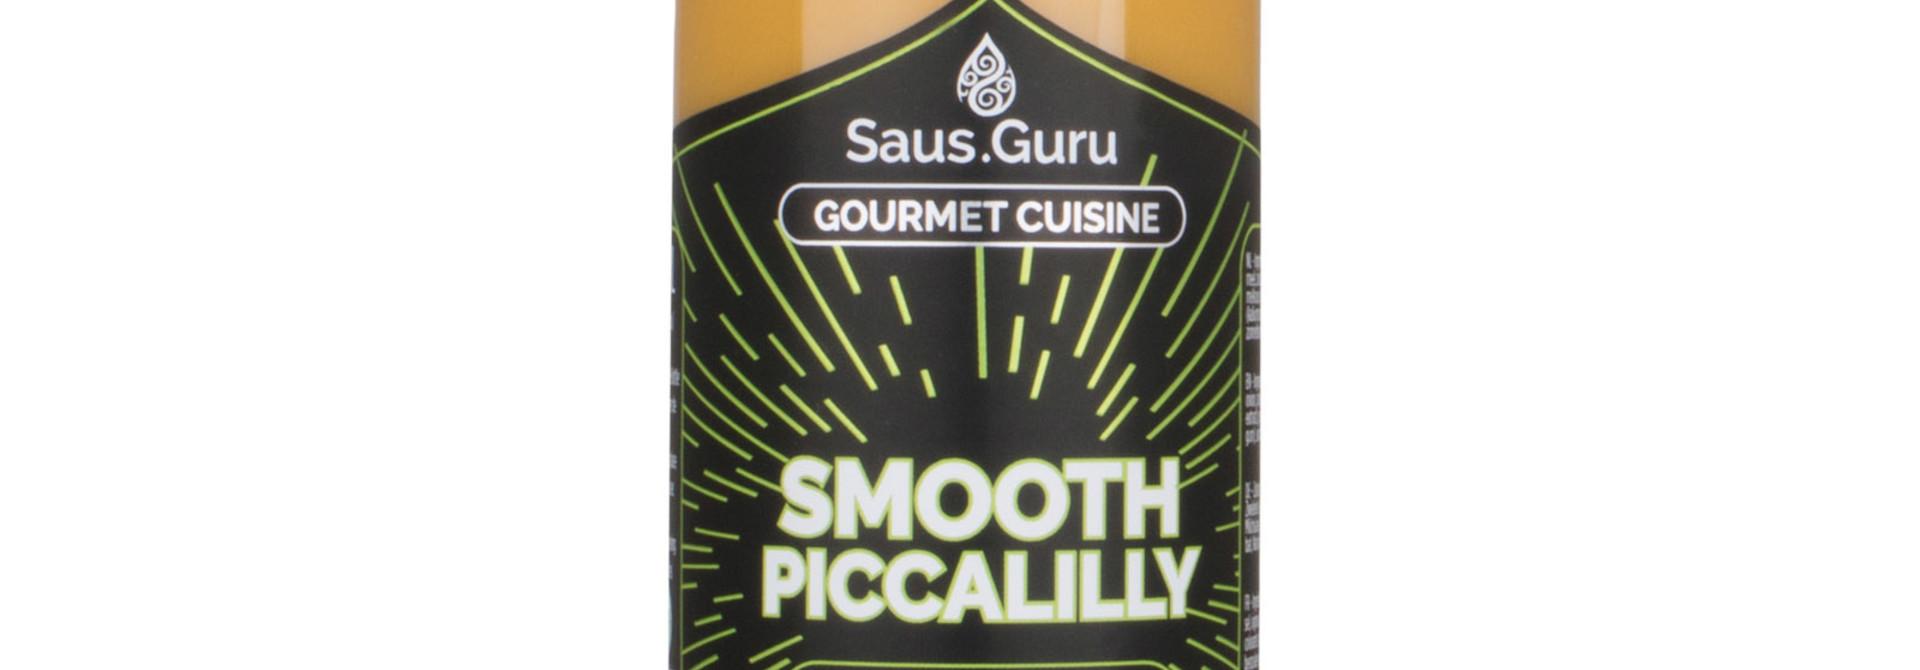 Saus.Guru's Smooth Piccalilly